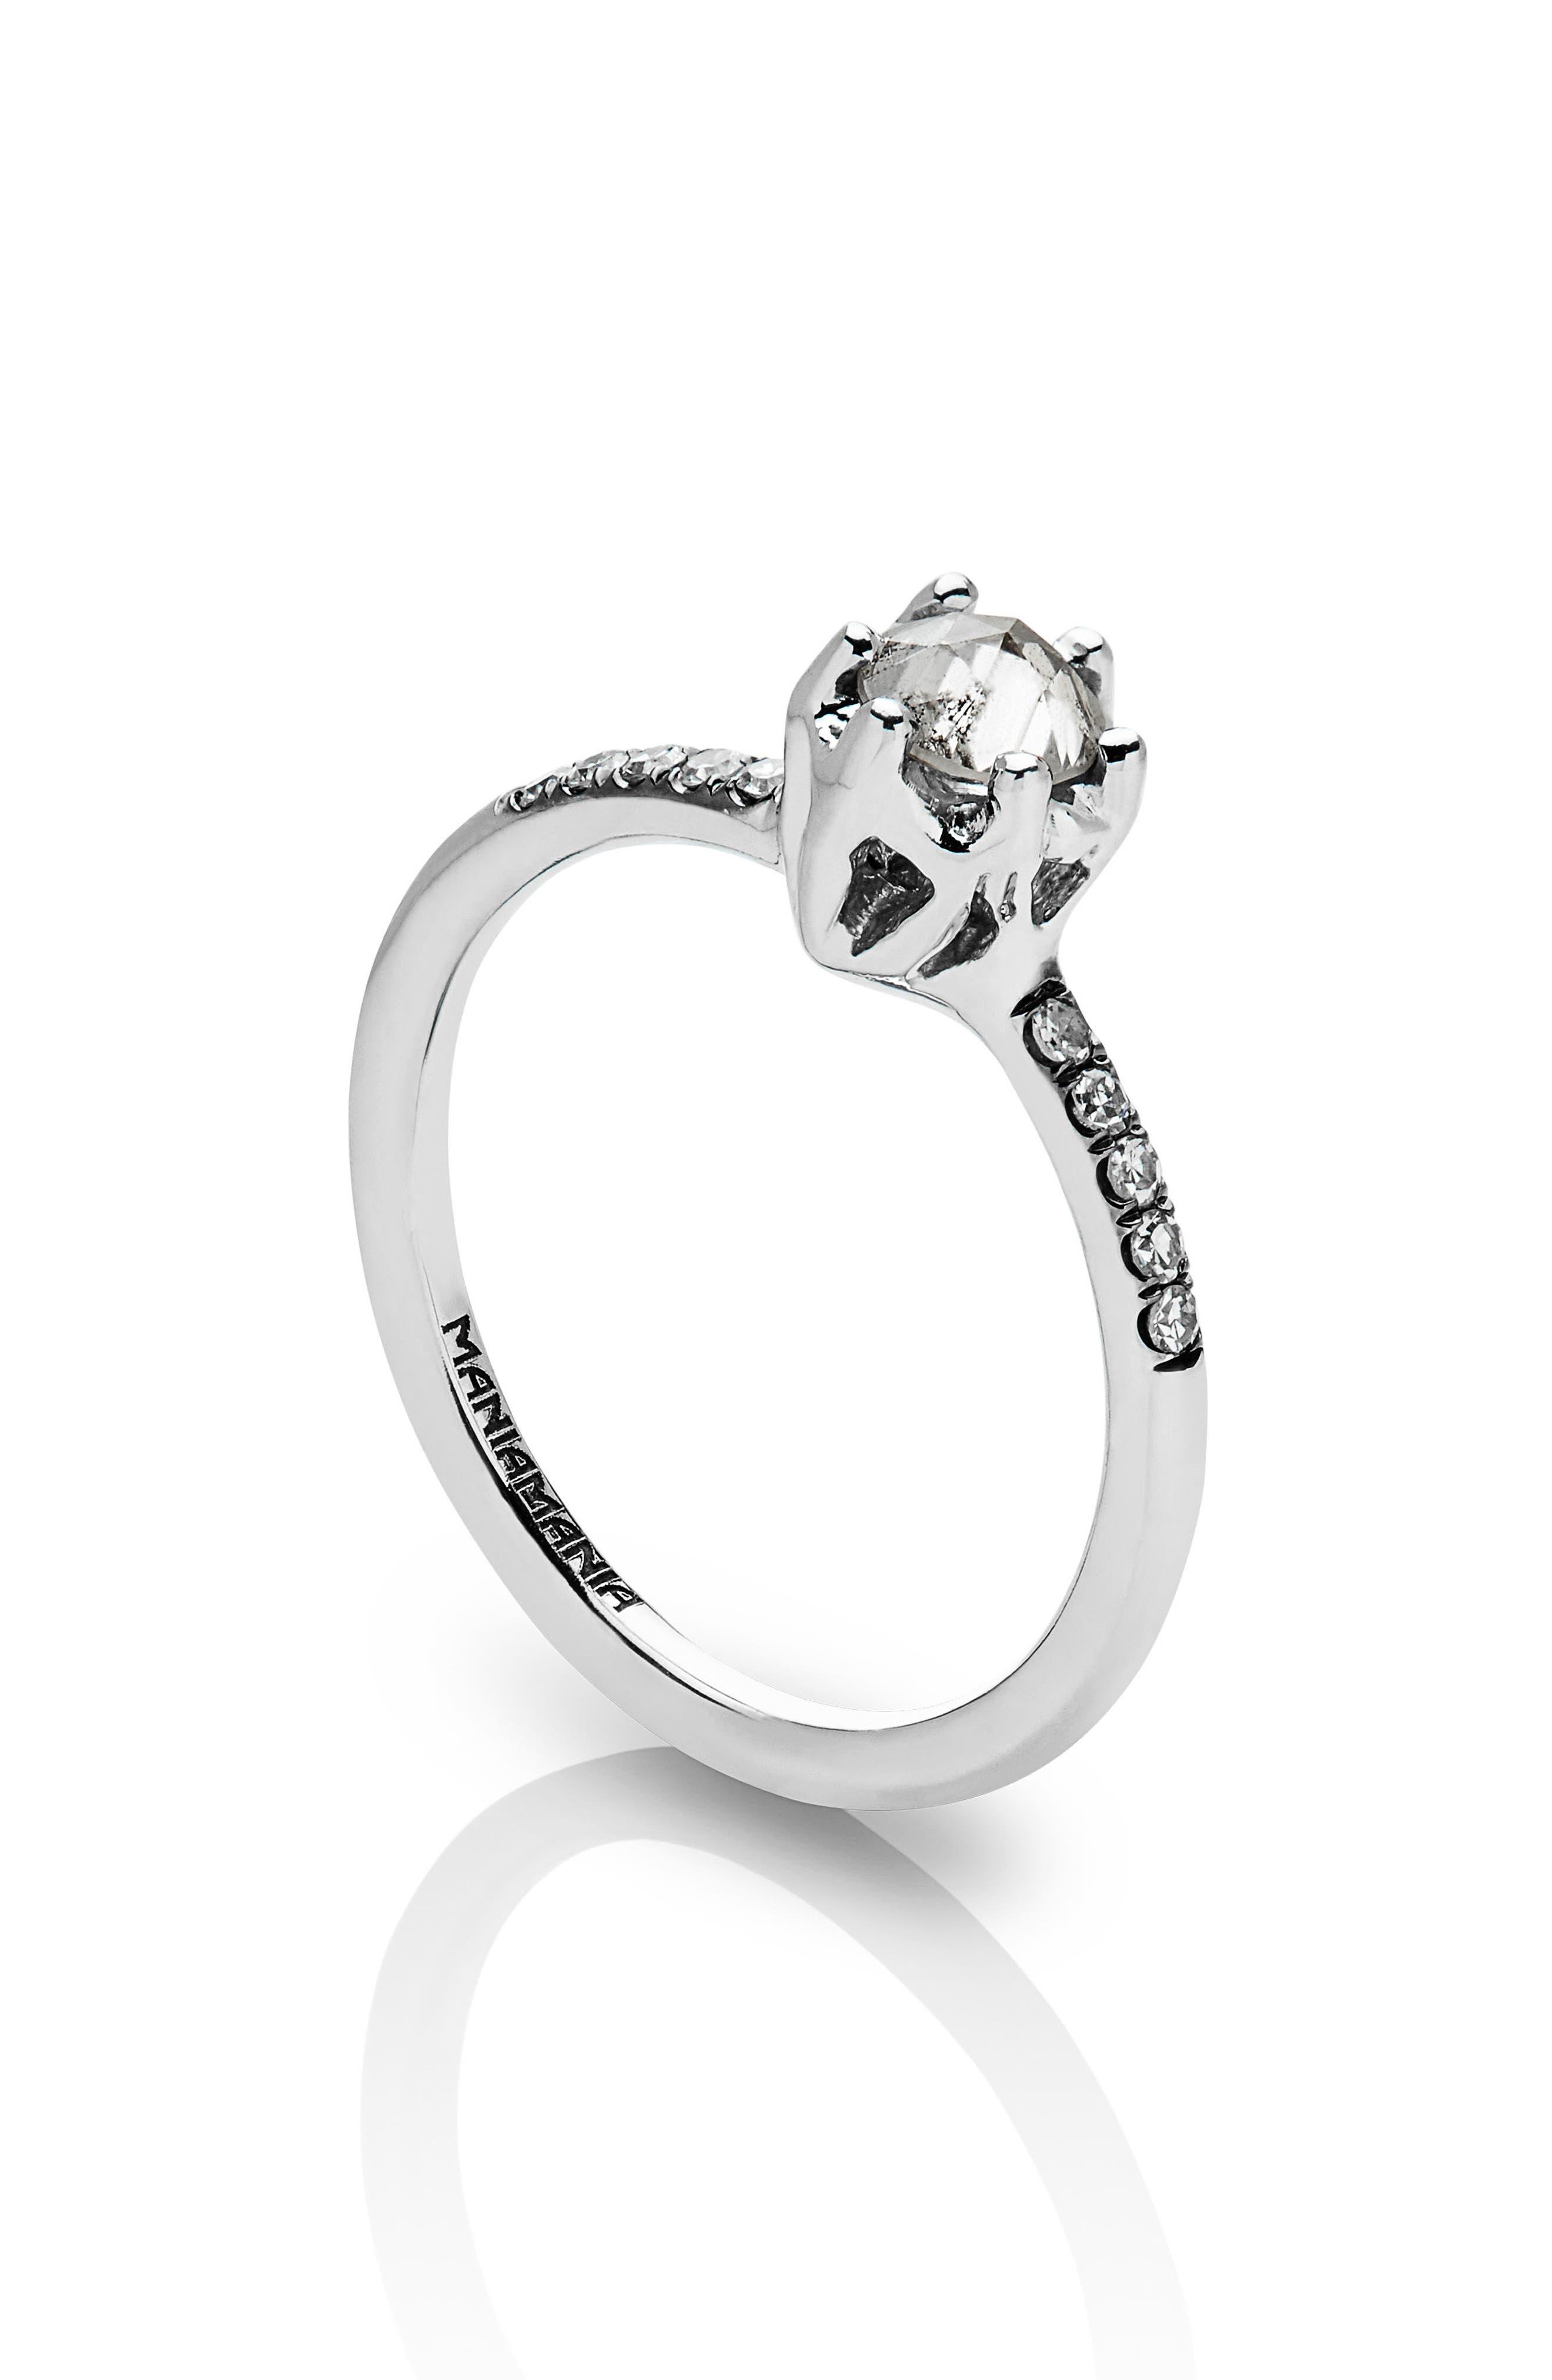 Entity Diamond Solitaire Ring,                             Alternate thumbnail 2, color,                             WHITE GOLD